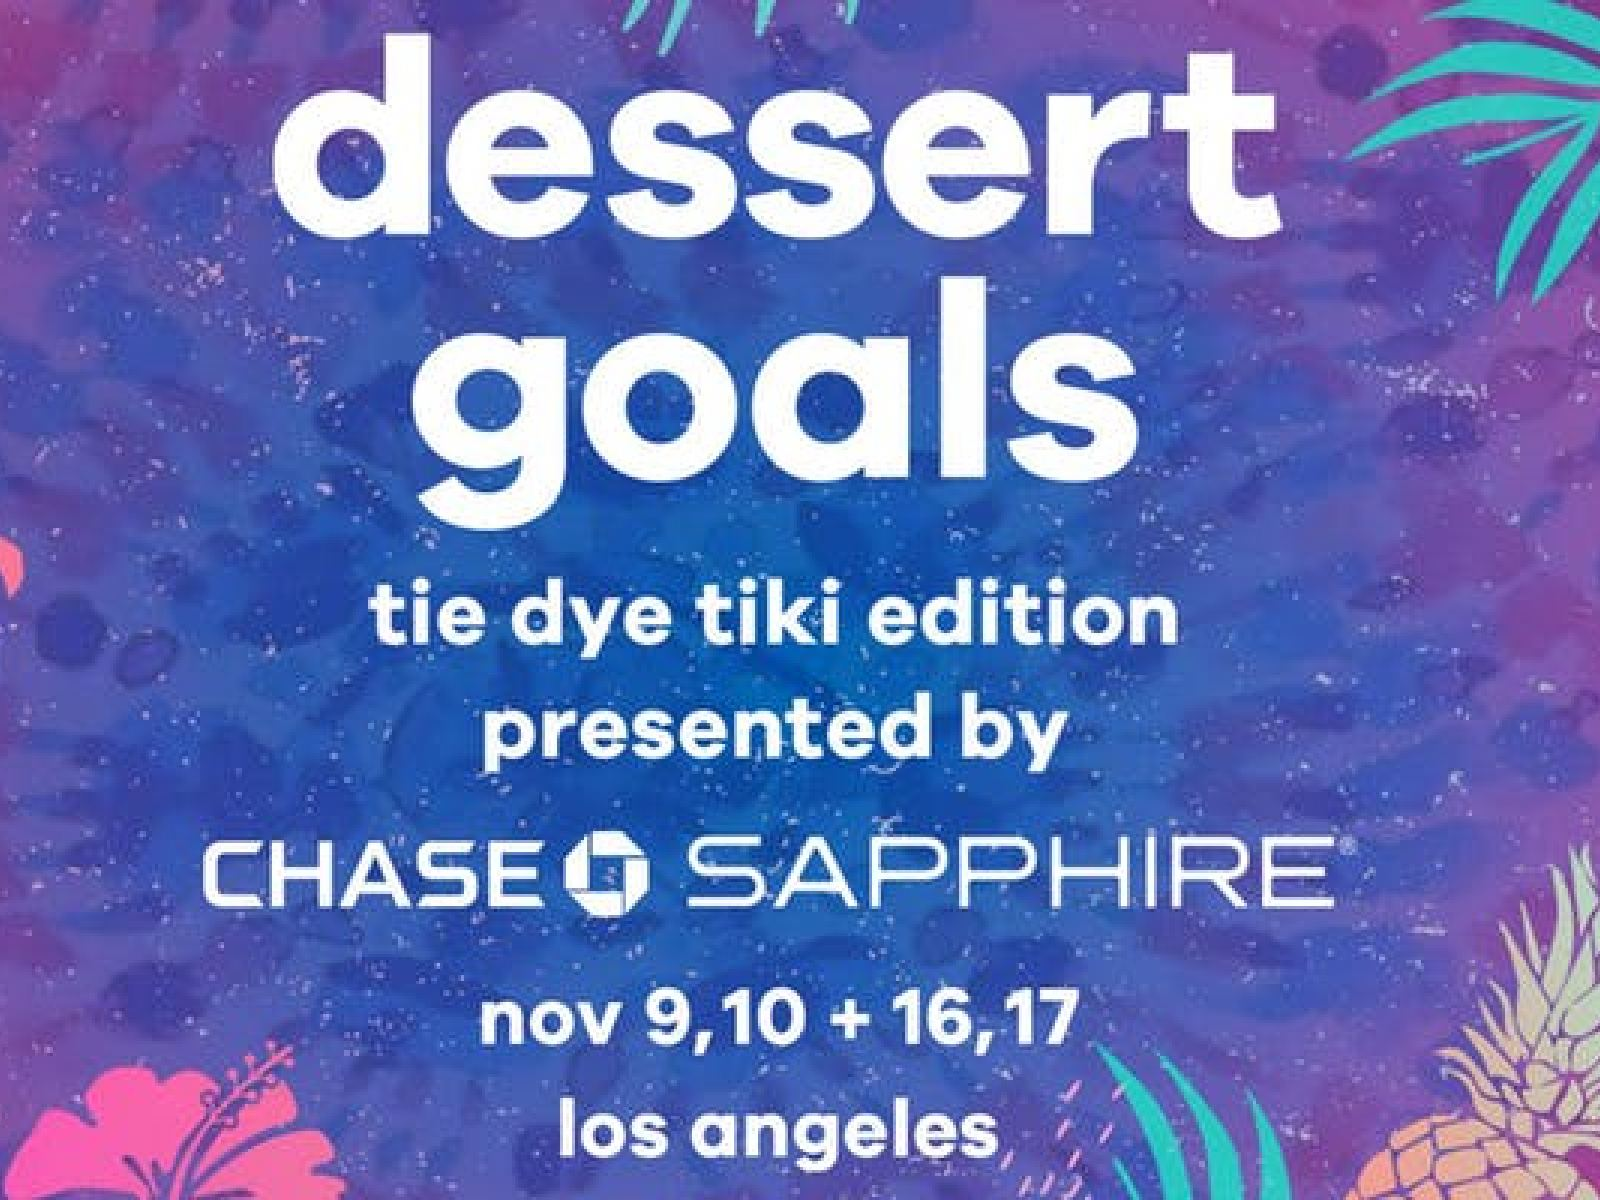 Main image for event titled Dessert Goals - Dessert Fest